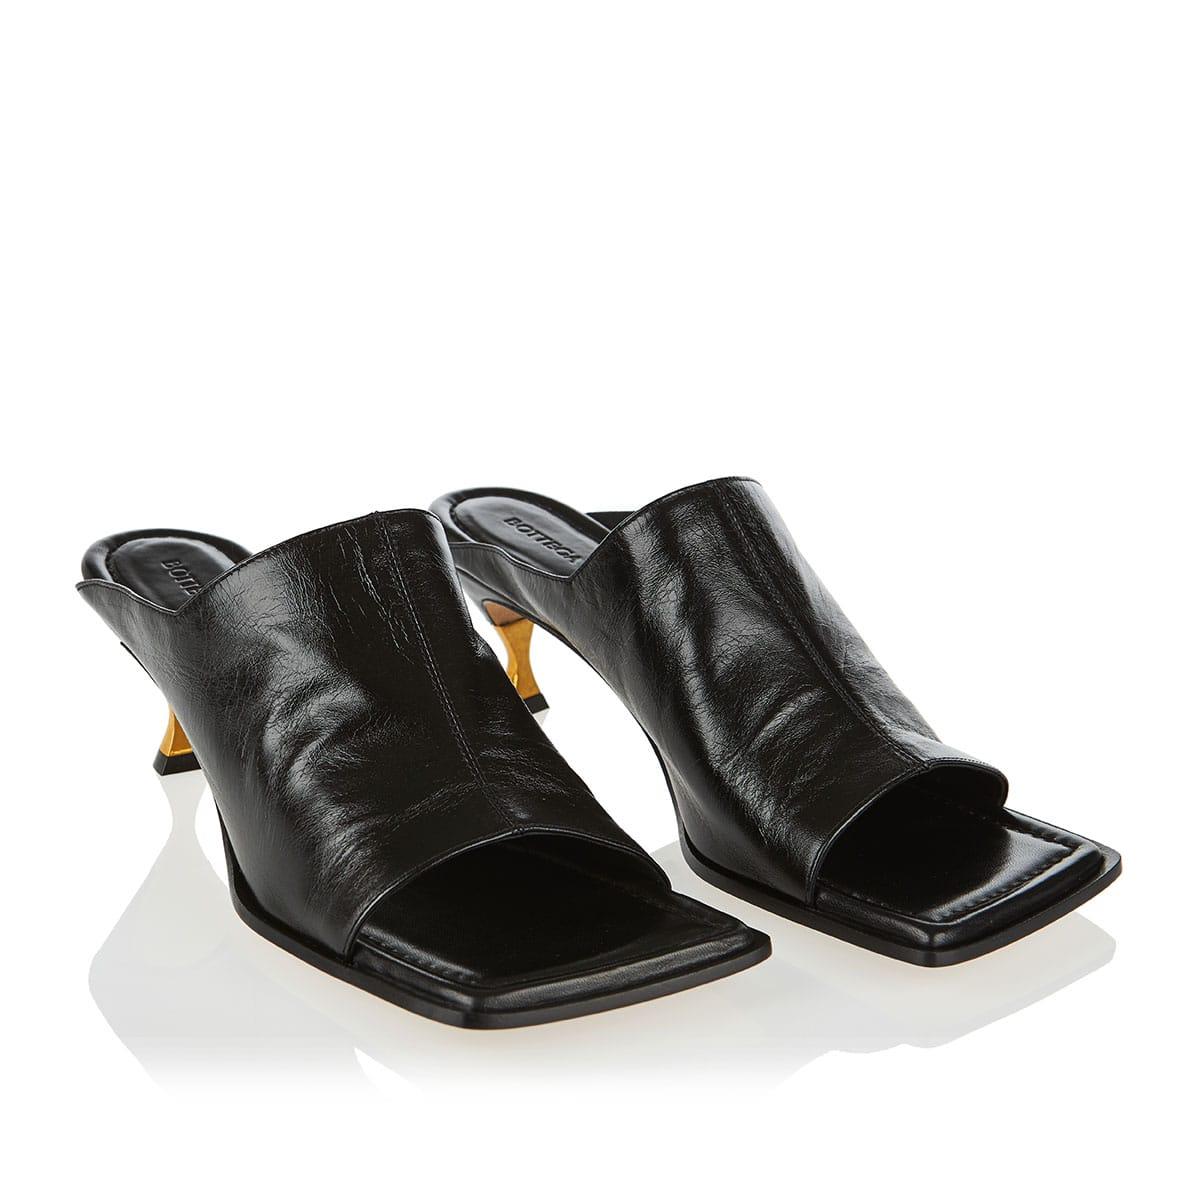 Square-toe leather mules